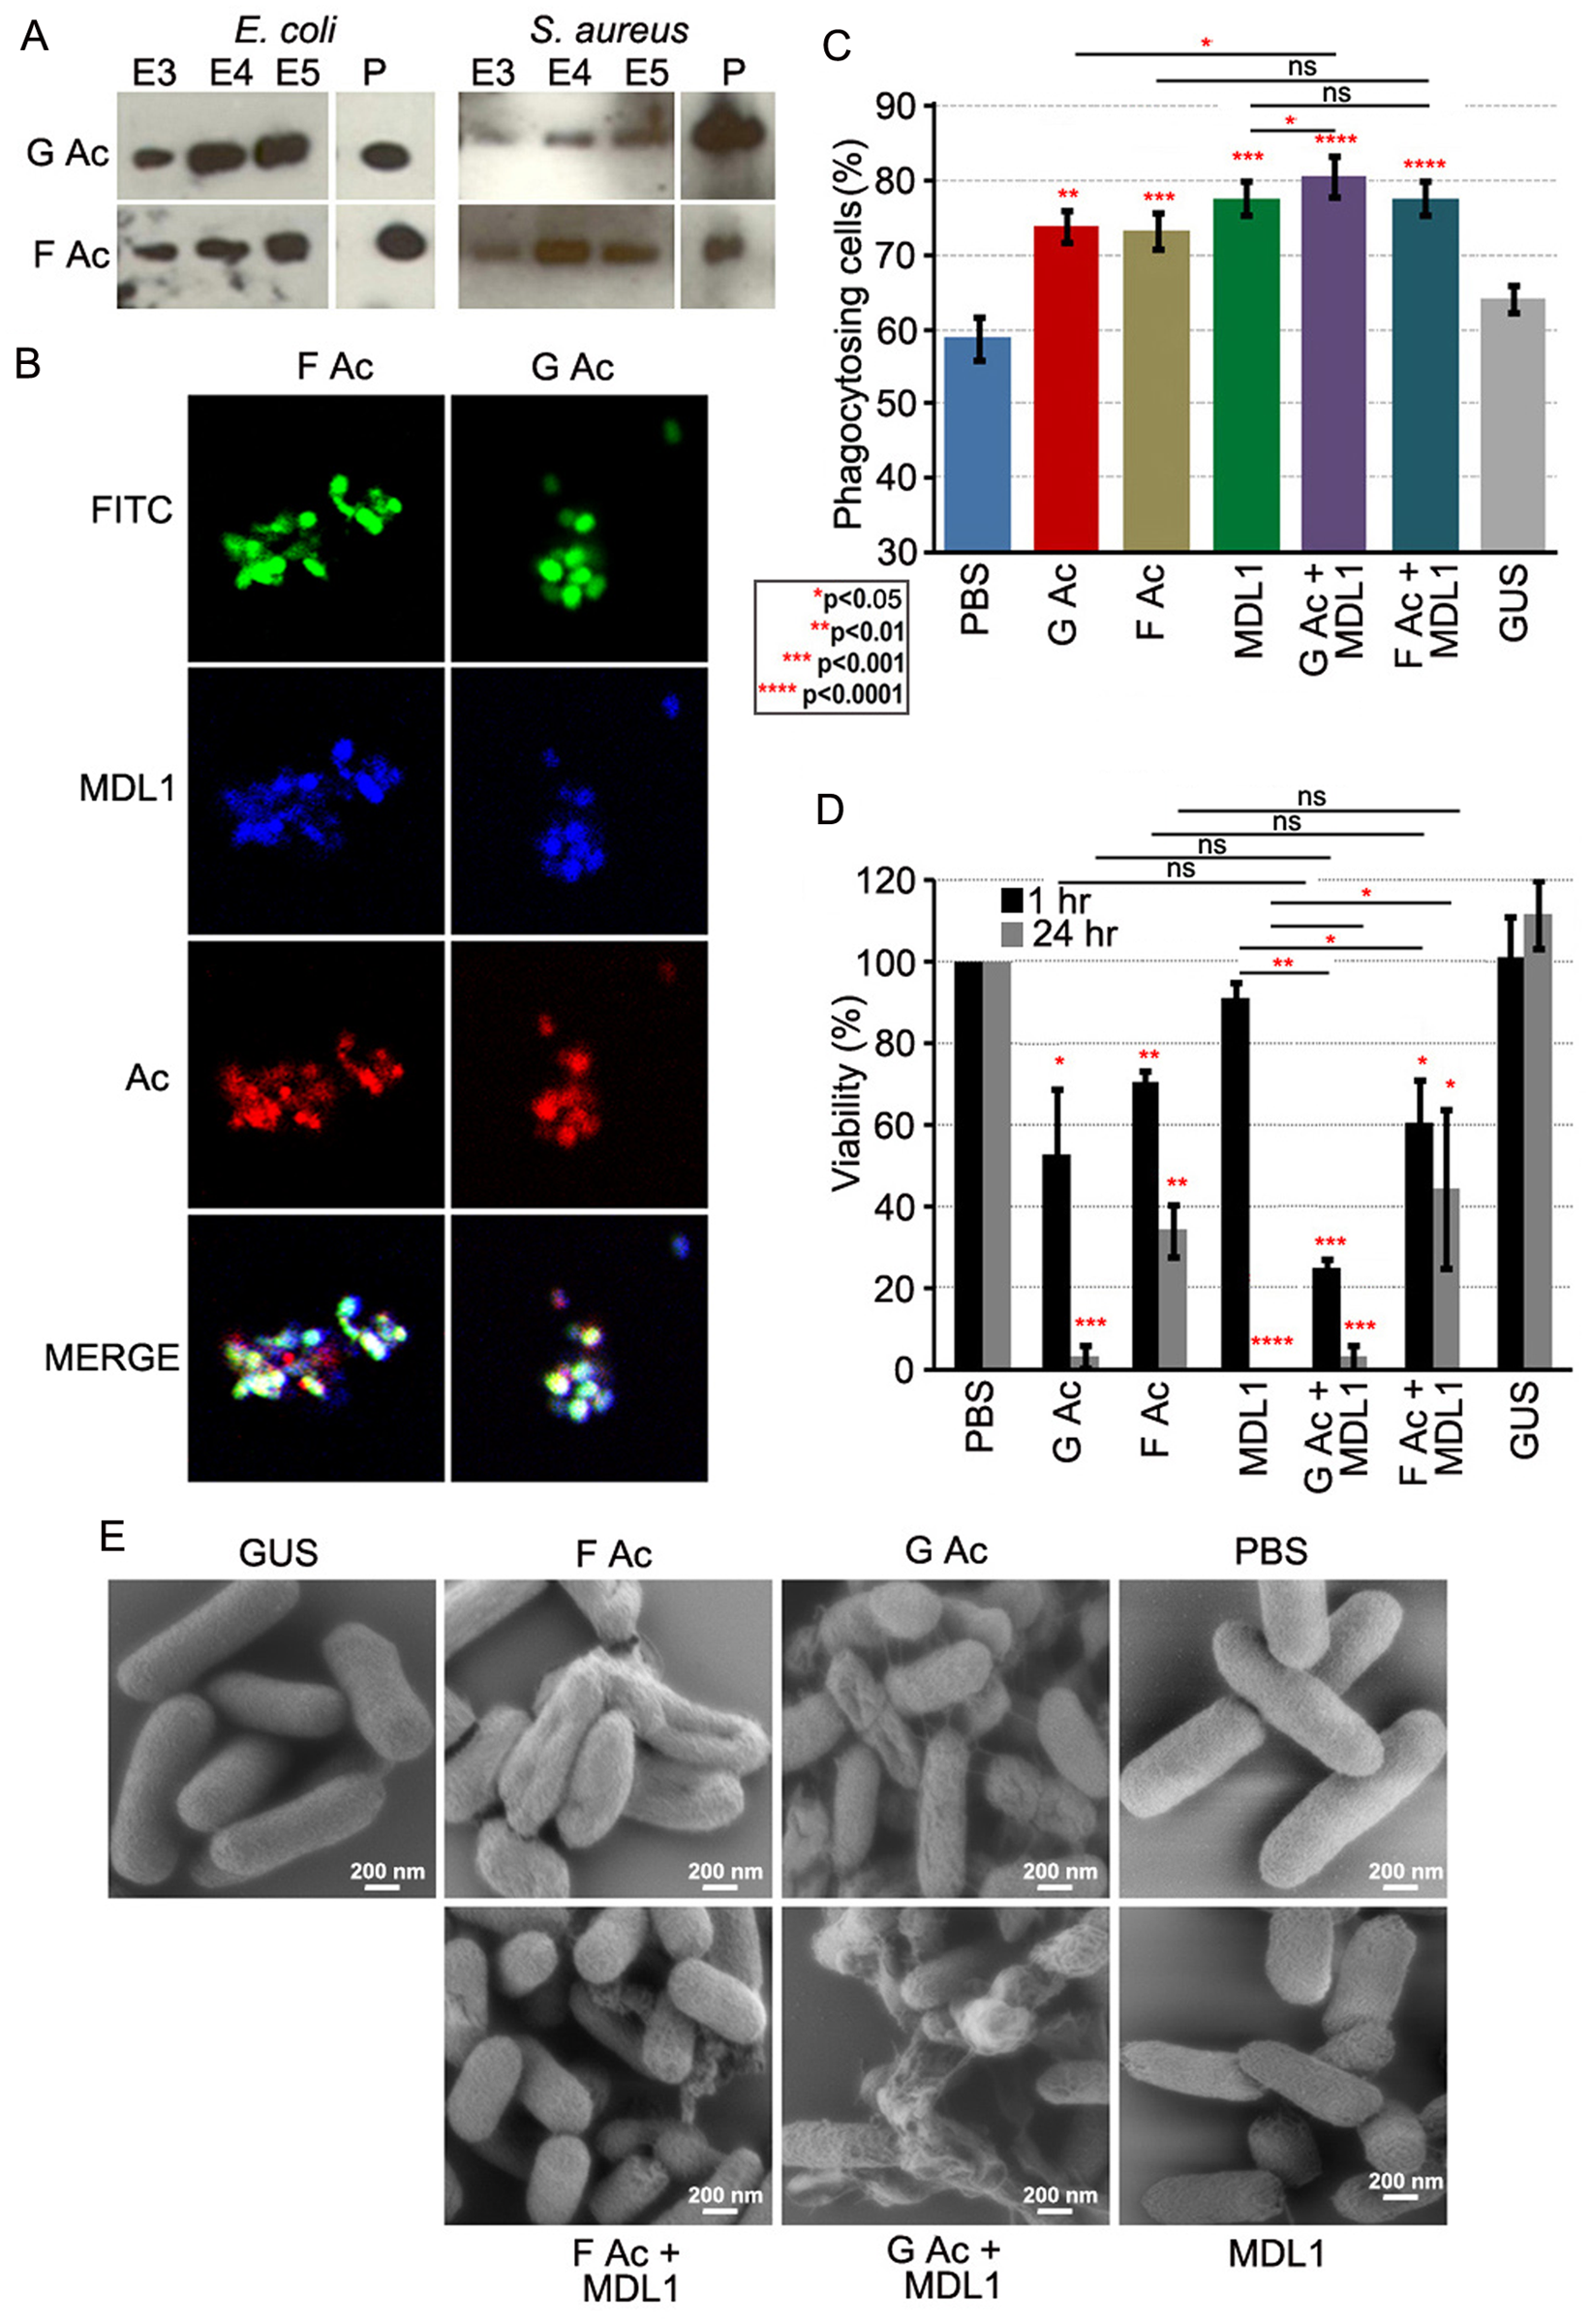 Globular and filamentous actin display different immune properties.